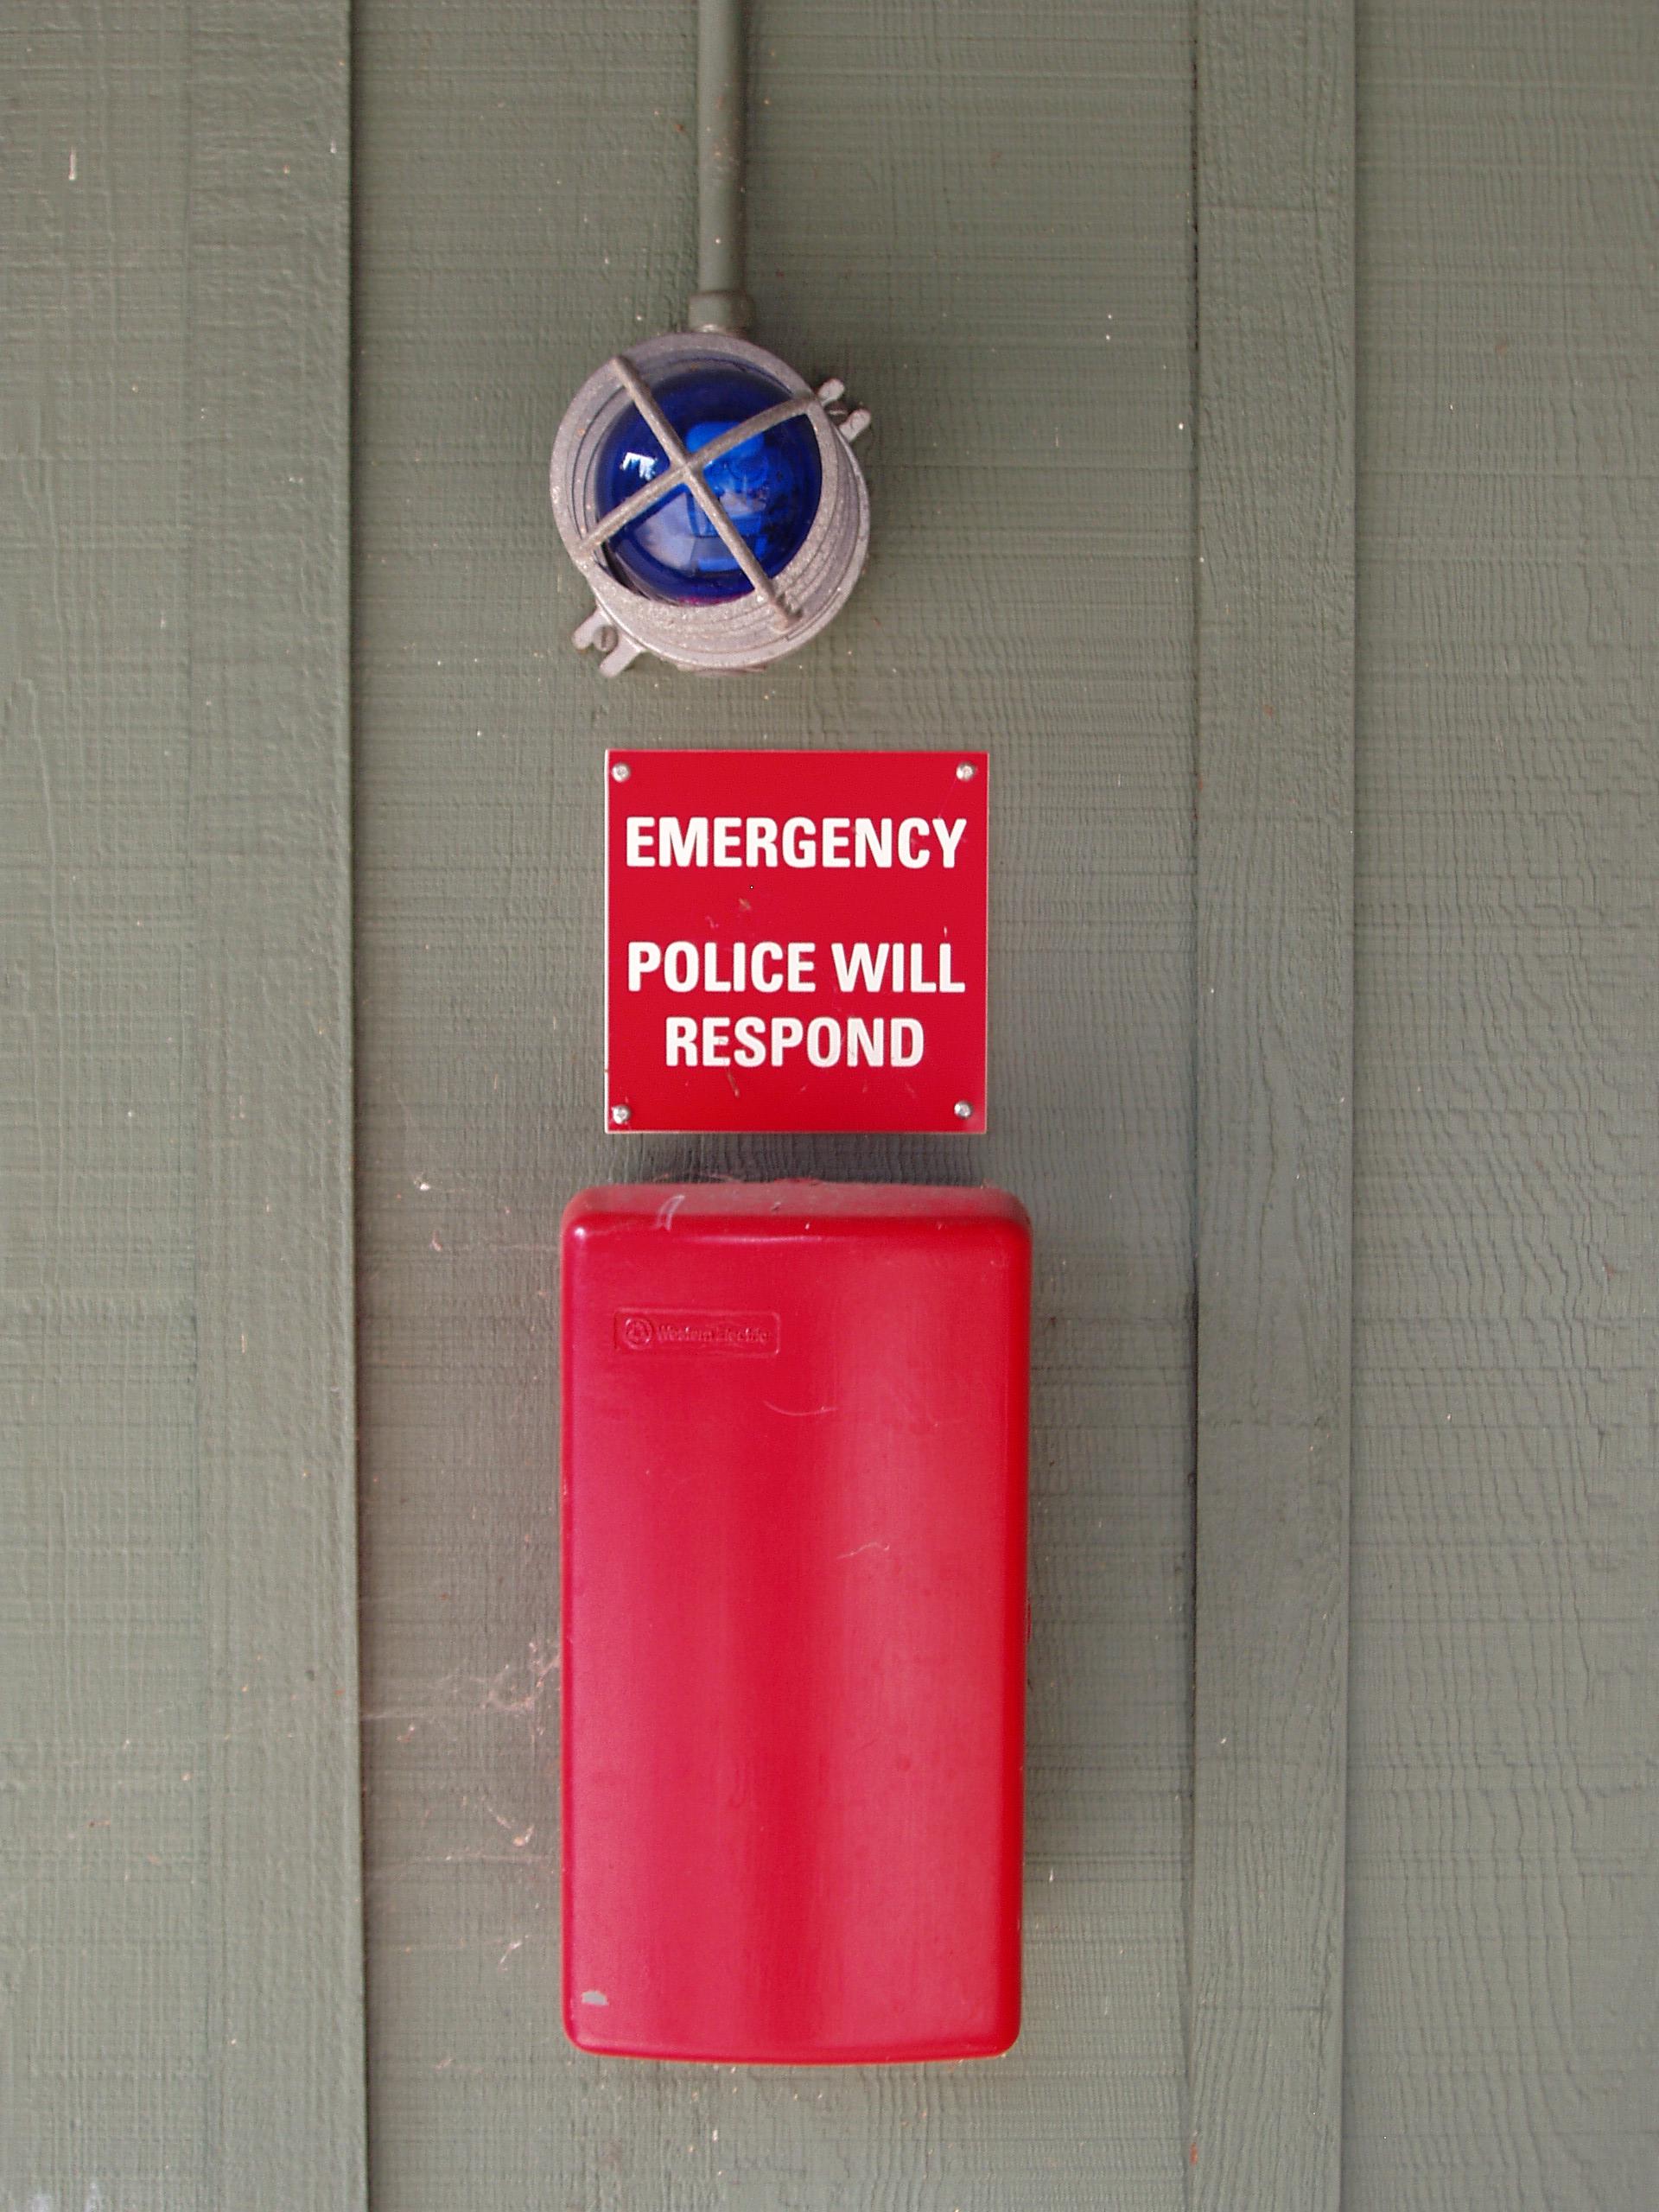 Blue Light Emergency Phones